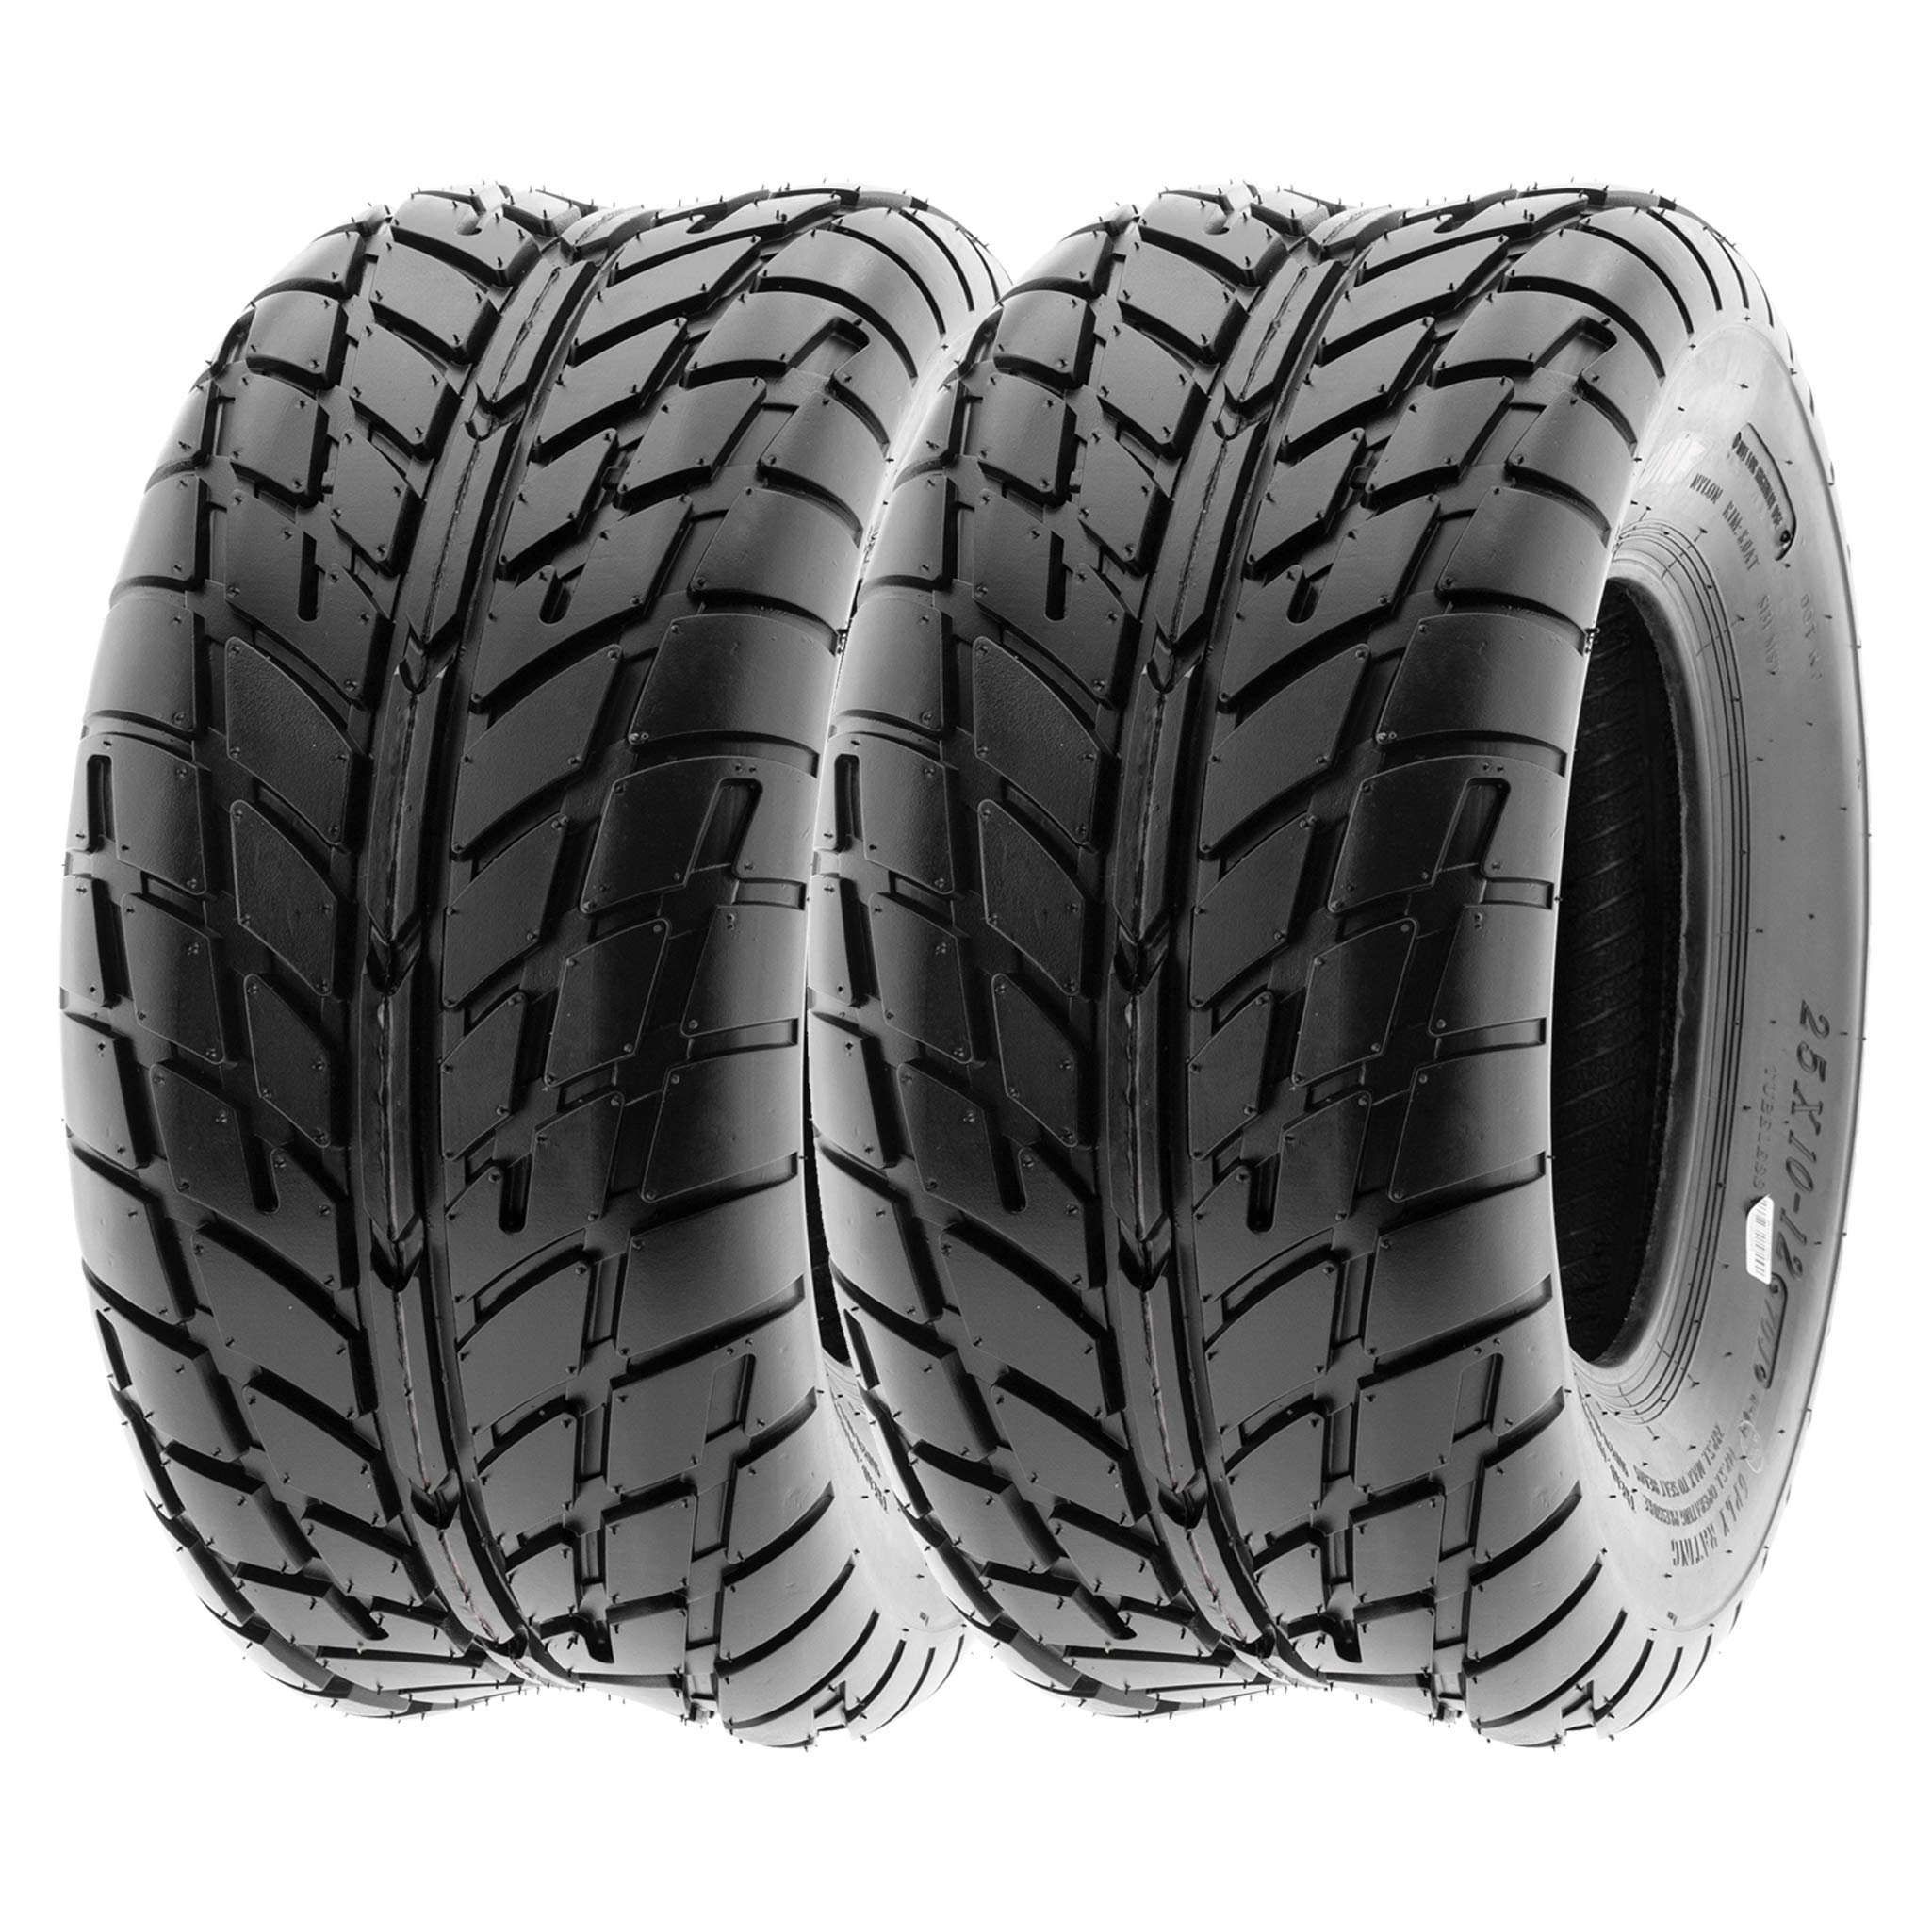 SunF Sport Race Replacement ALL TERRAIN ATV UTV 6 Ply Tires 21x7-10 /& 20x10-9 Tubeless A021, Set of 4